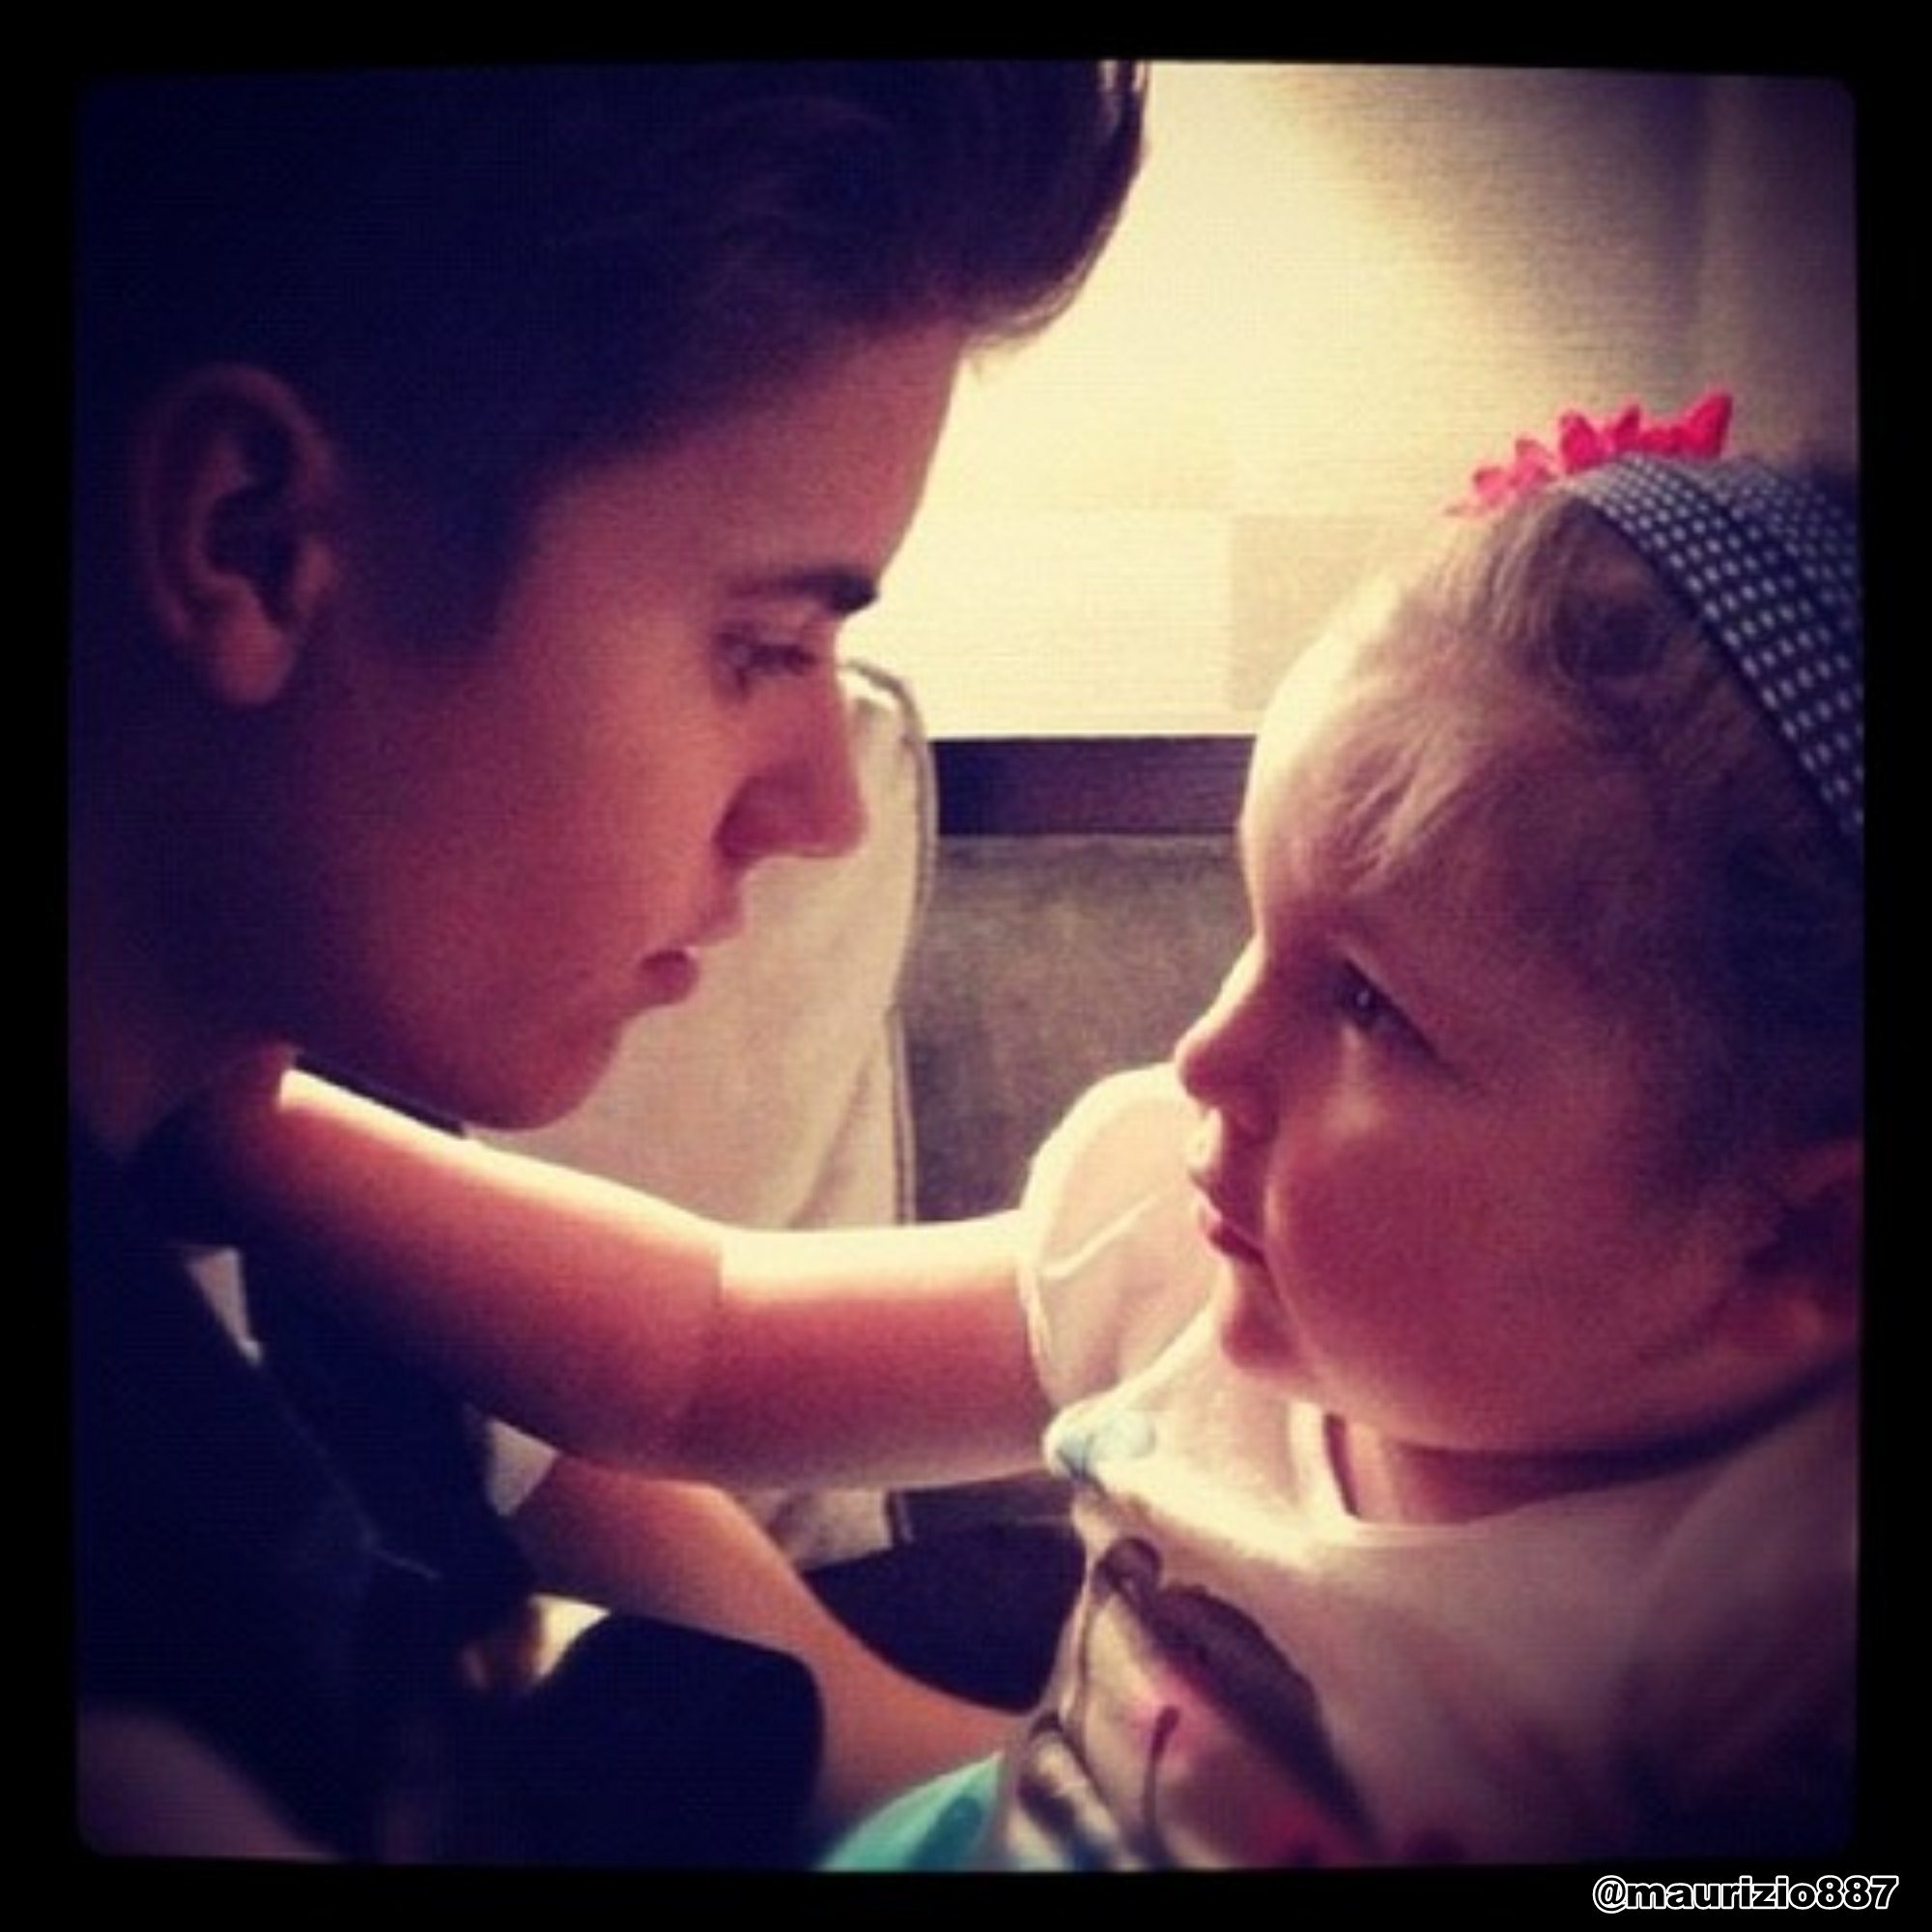 justin bieber, instagram avalanna my angel 2012 - Justin ...